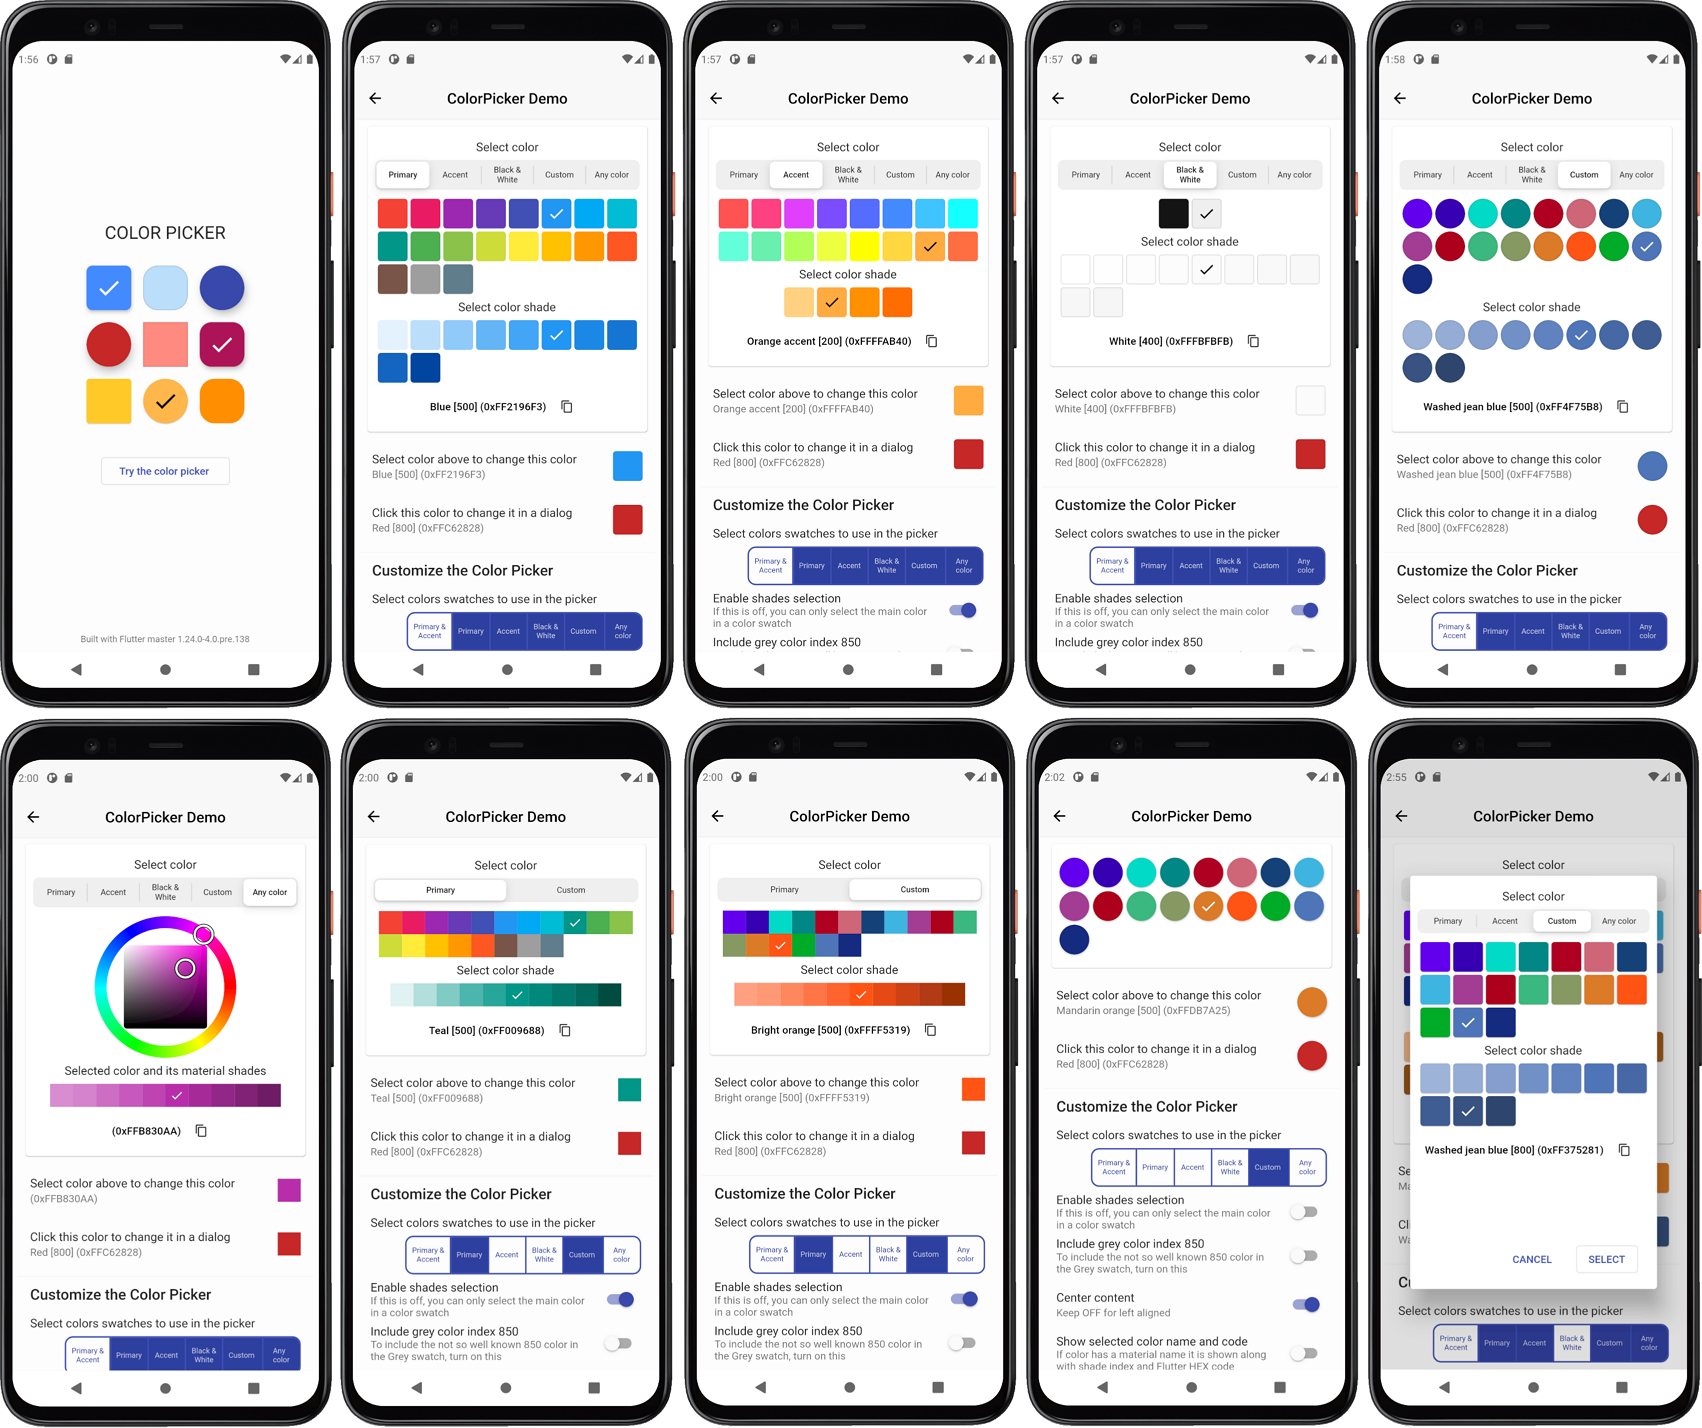 ColorPicker screens